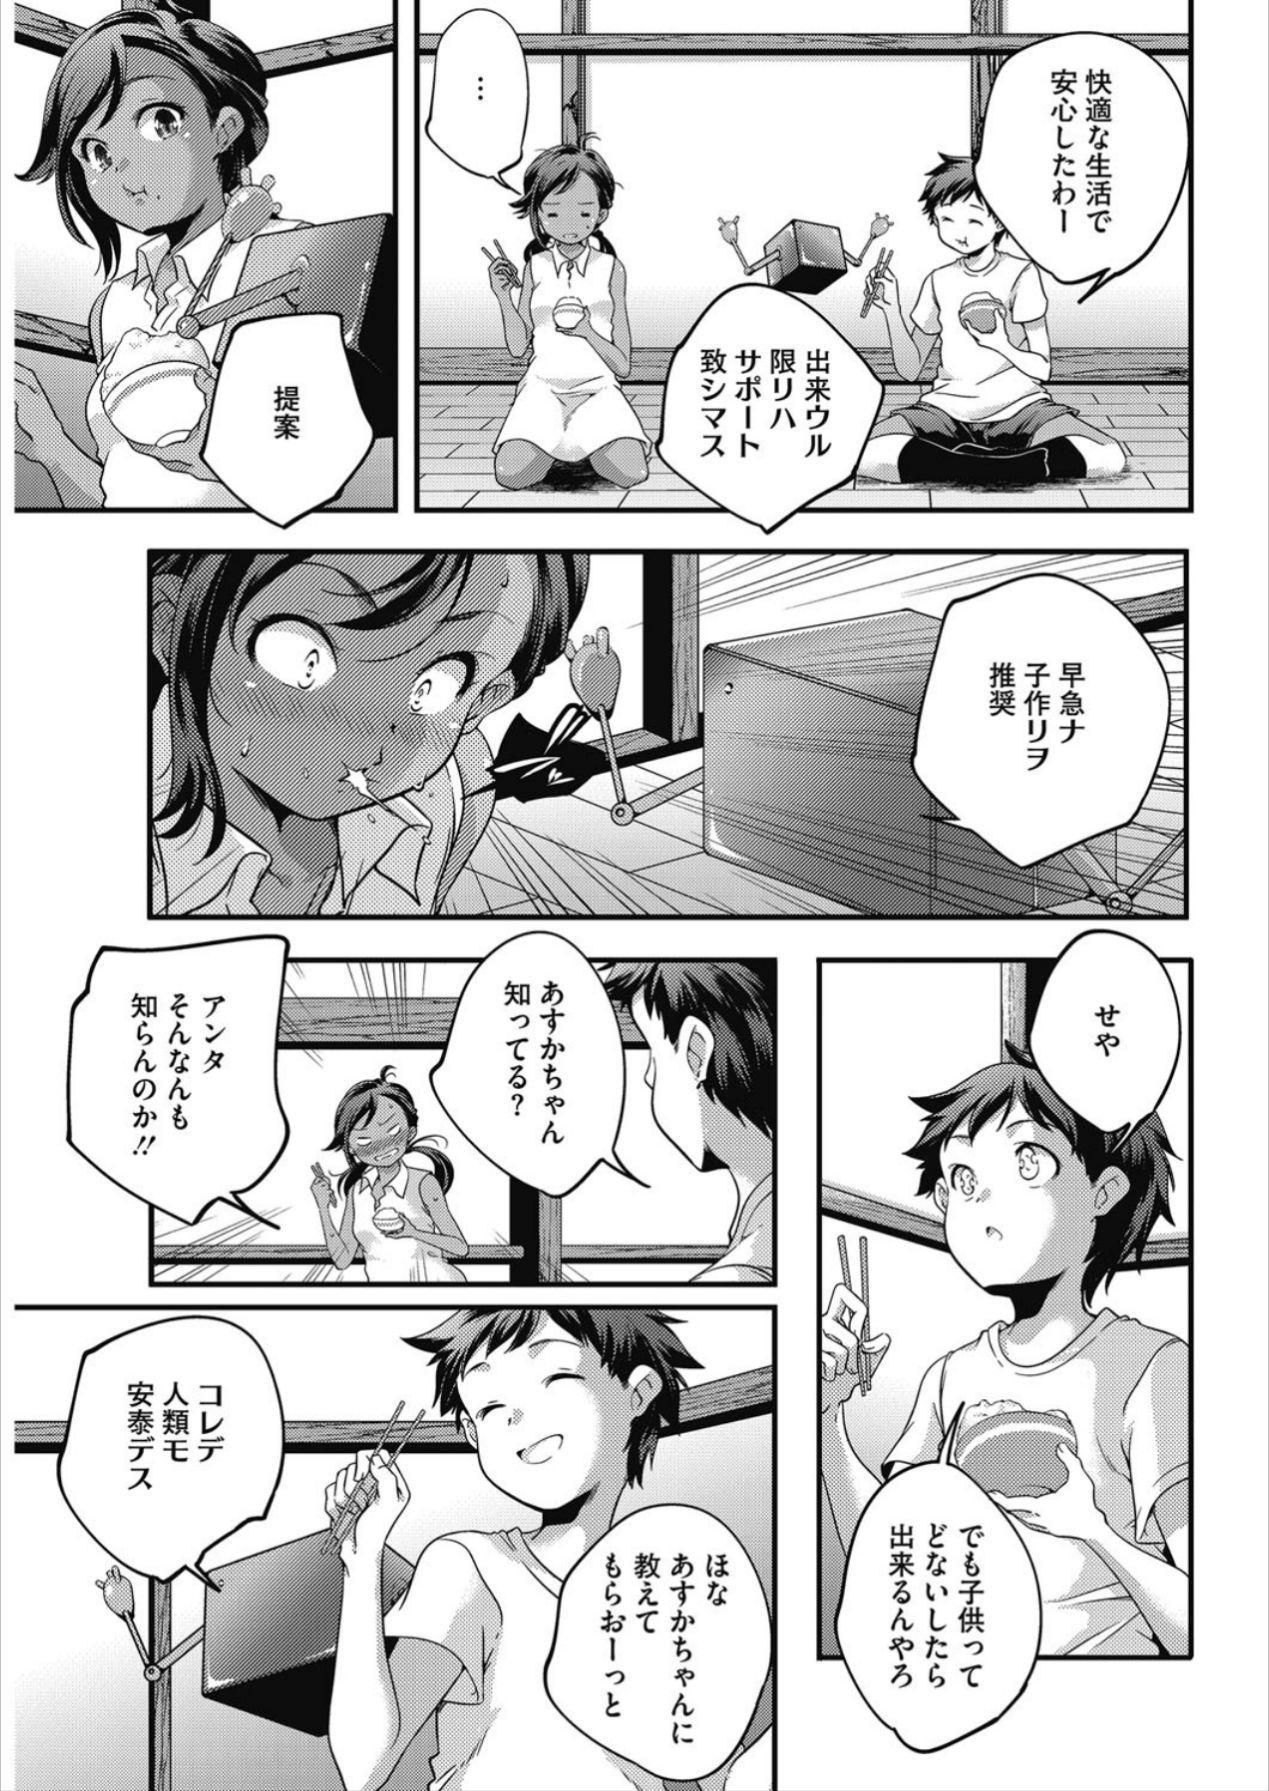 [Anthology] LQ -Little Queen- Vol. 21 [Digital] 76